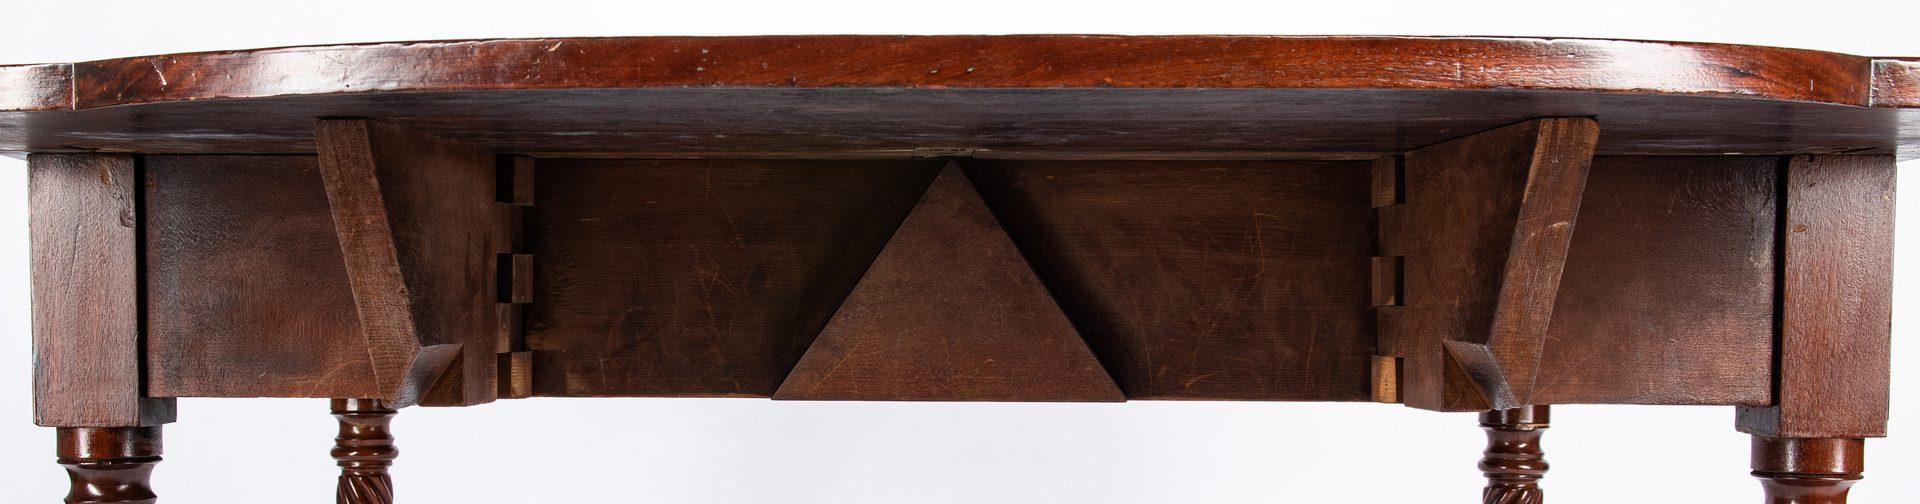 Lot 232: English Mahogany Pembroke Table